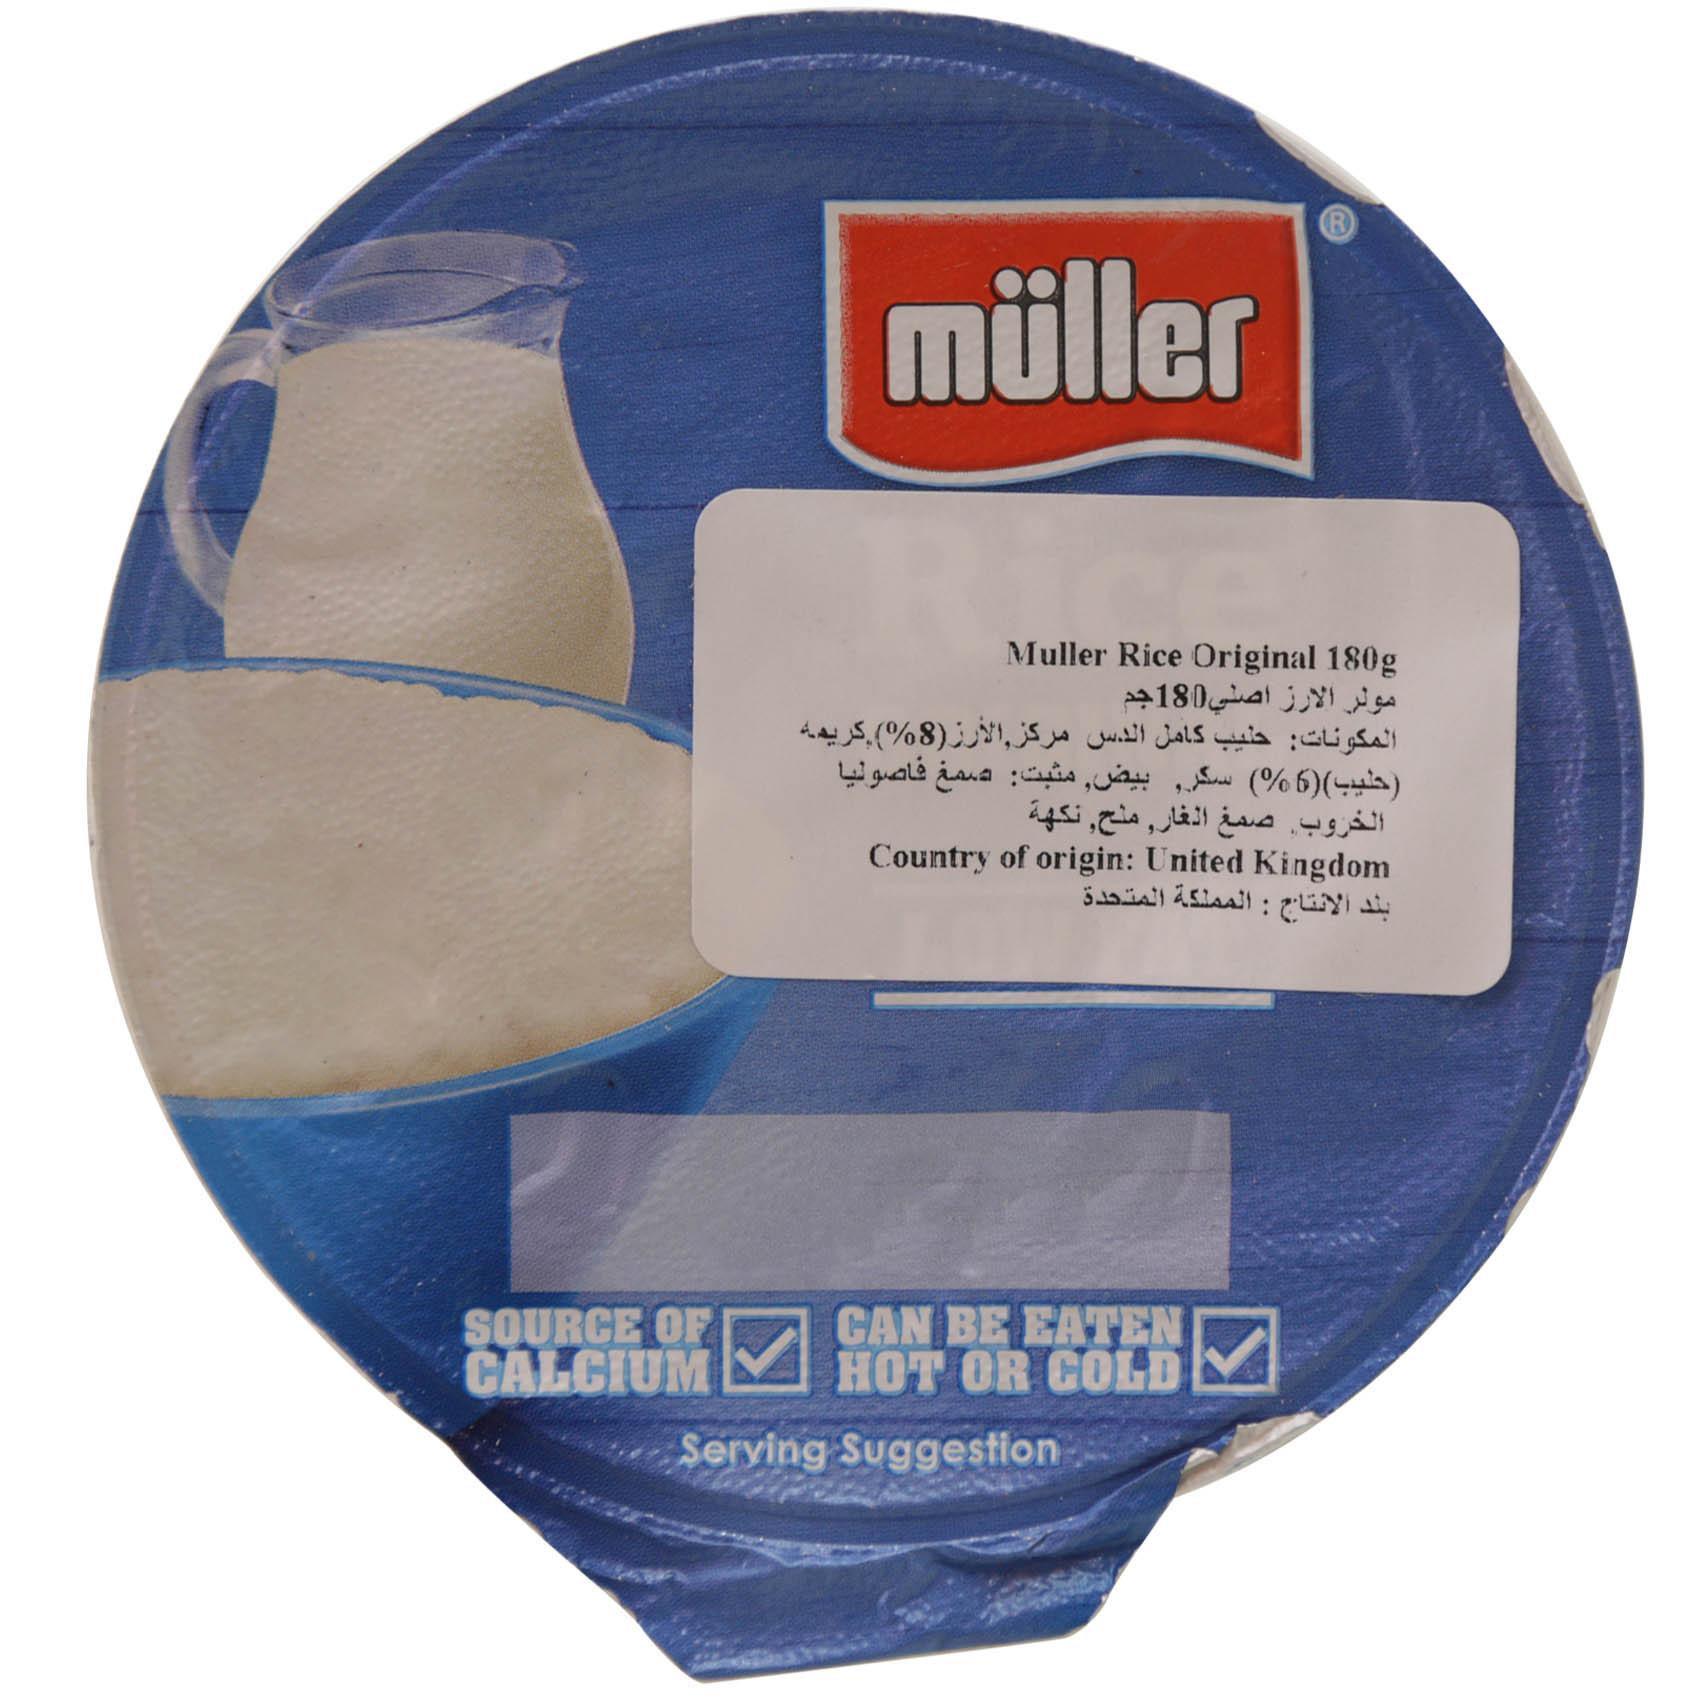 MULLER RICE ORIGINAL 200G